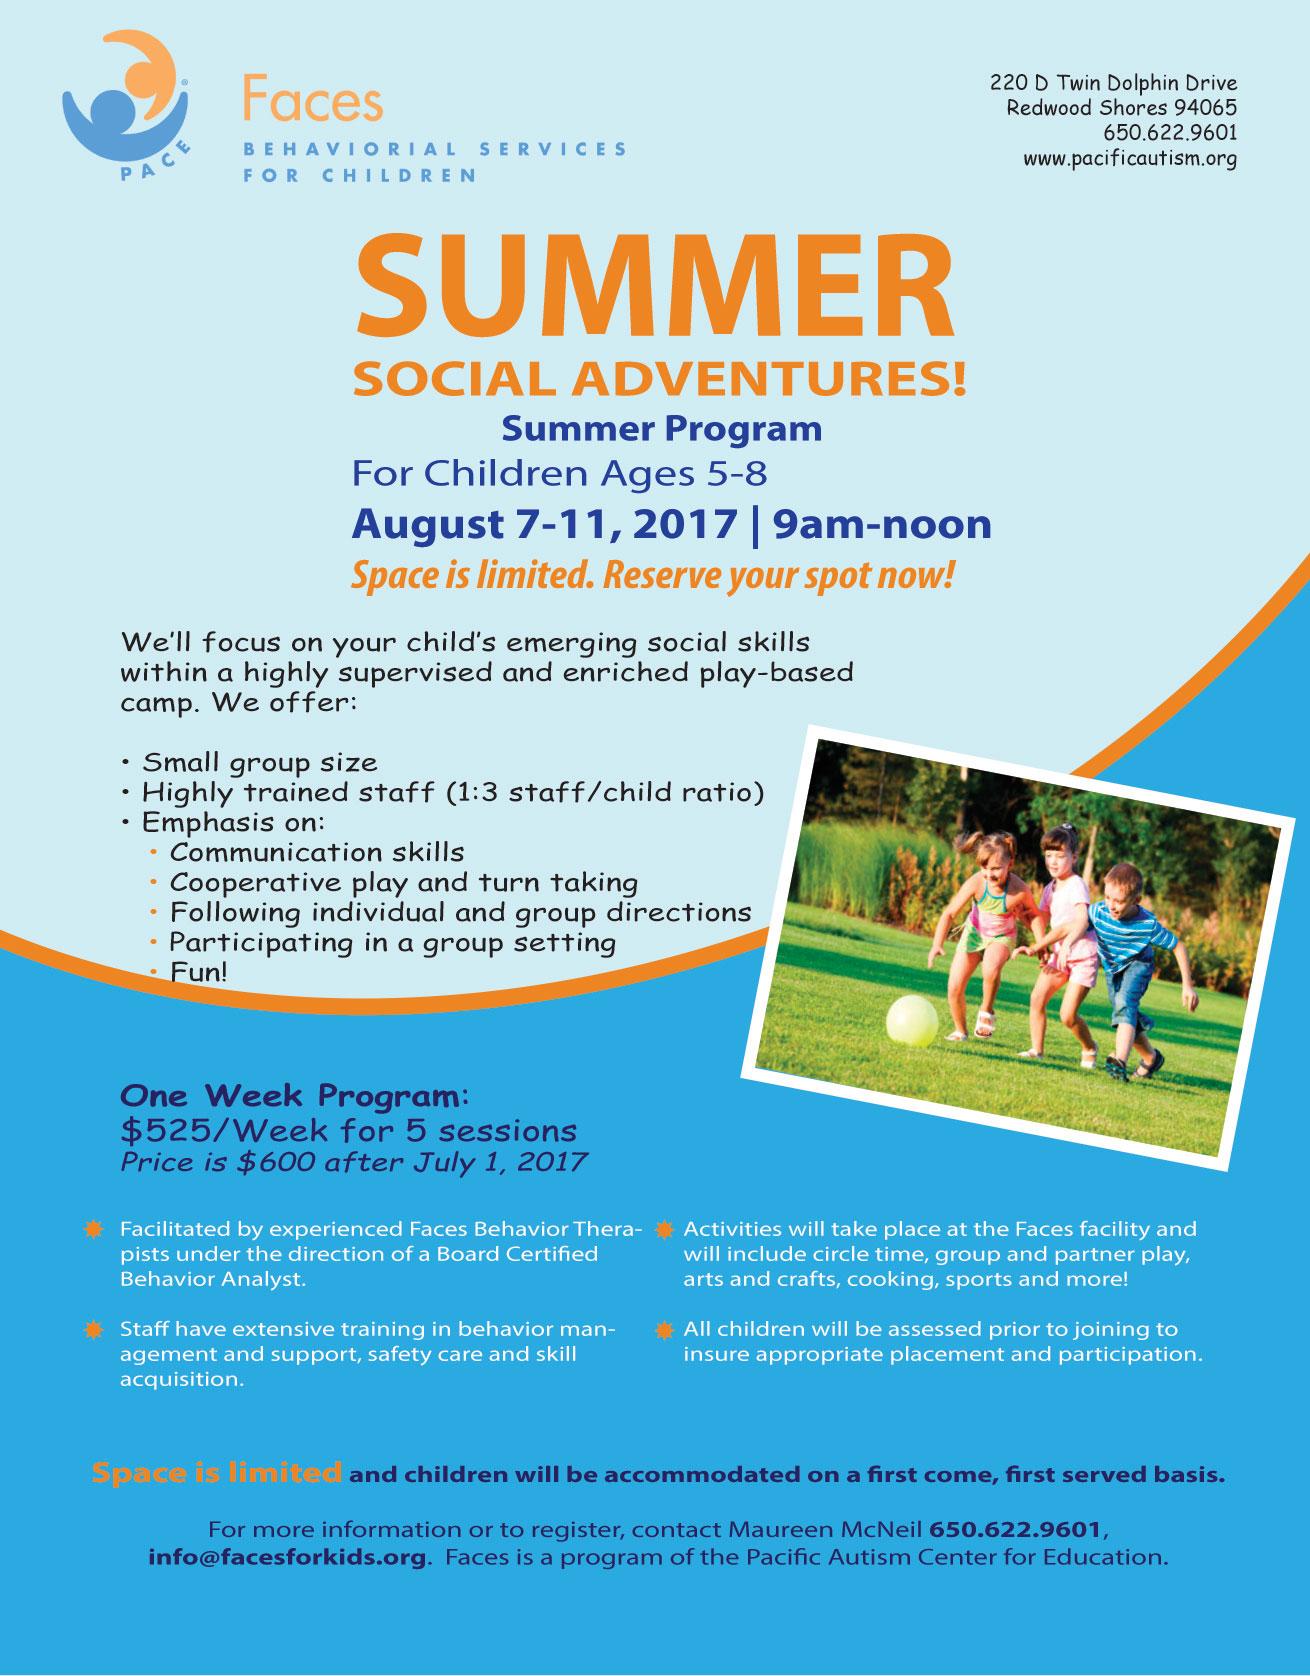 Faces Summer Program 2017